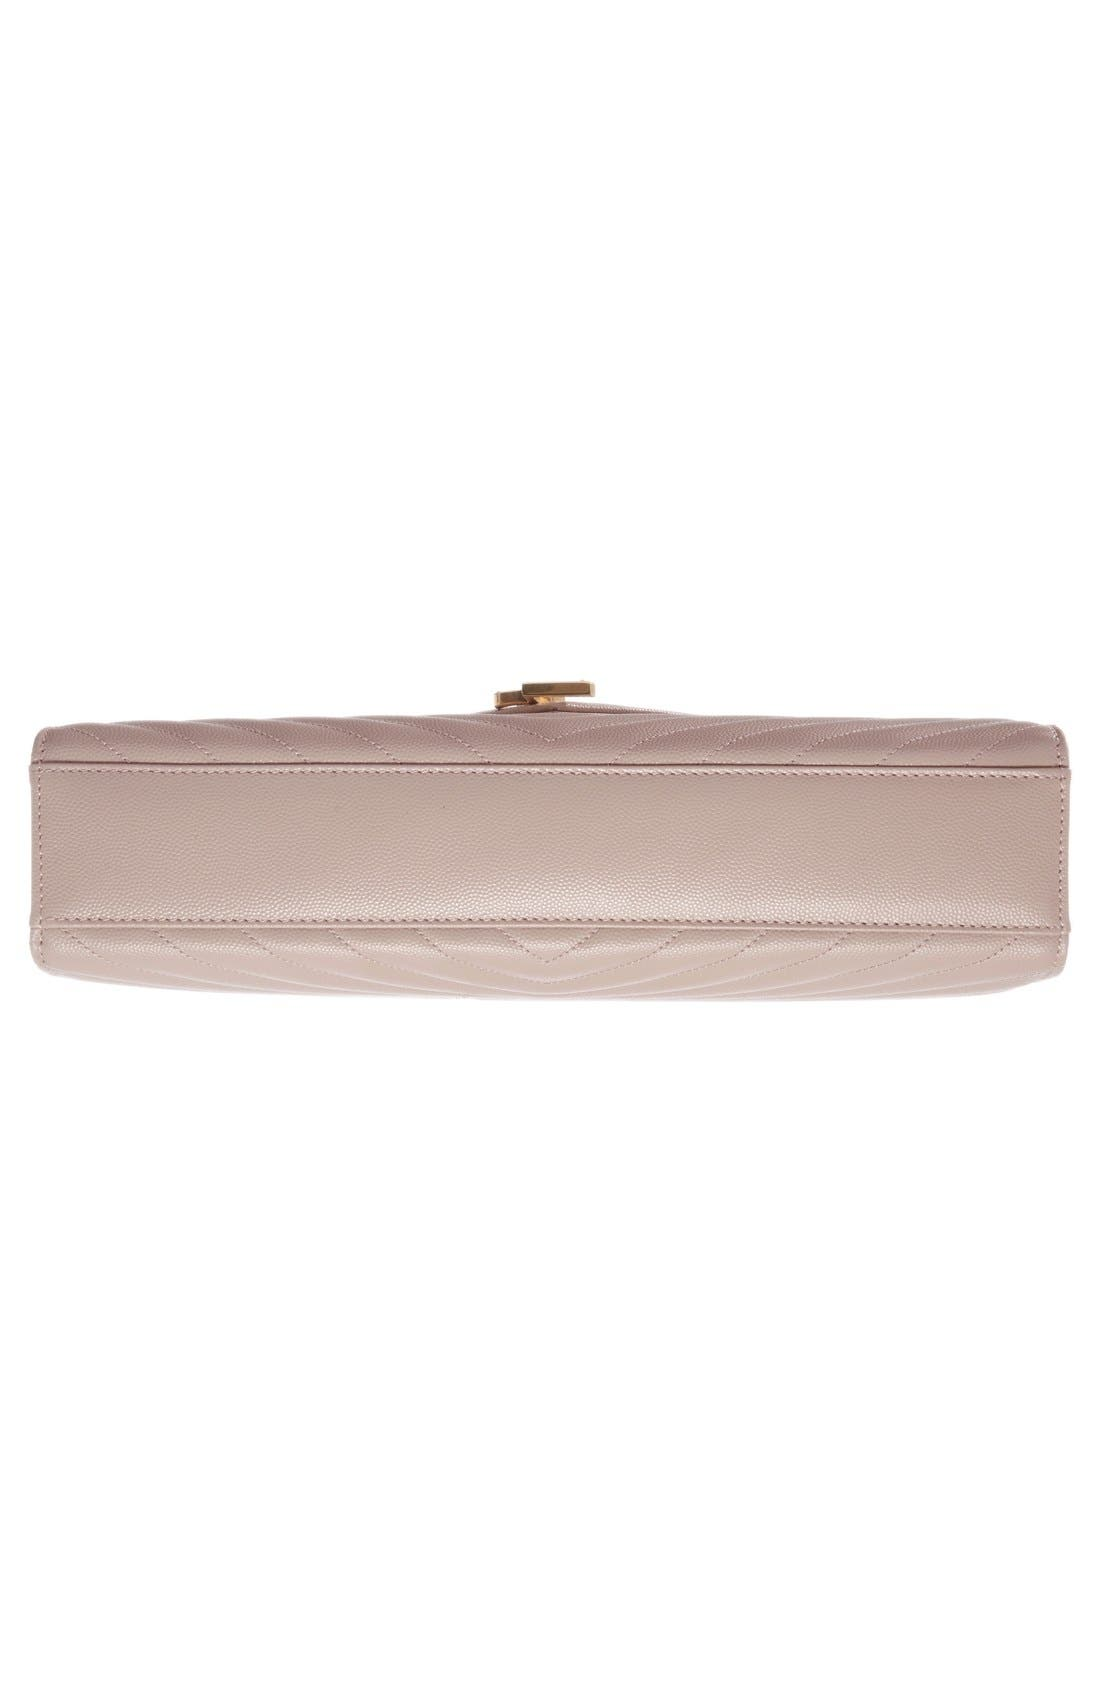 ,                             'Large Monogram' Grained Leather Shoulder Bag,                             Alternate thumbnail 49, color,                             657